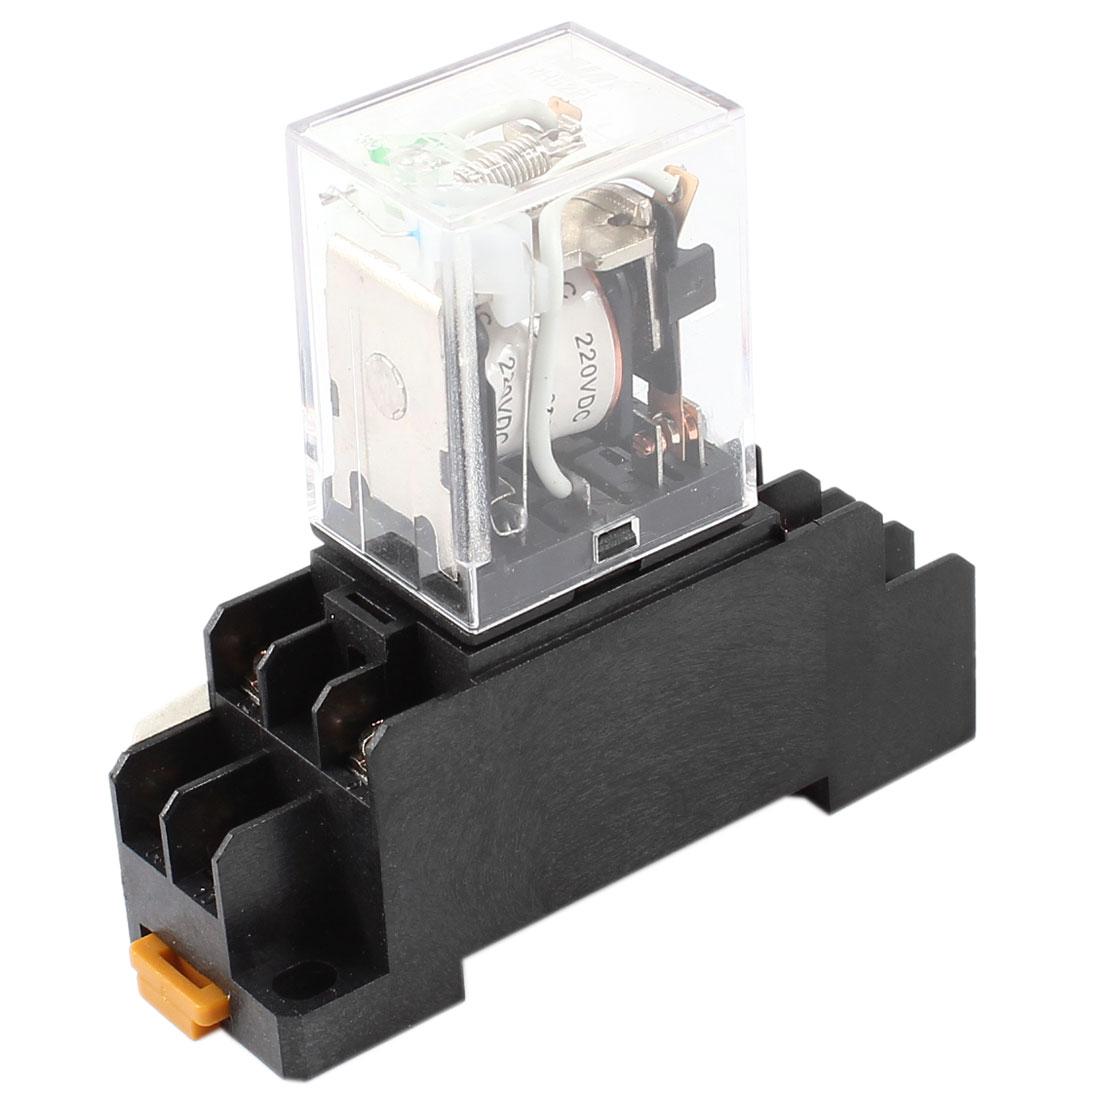 DC 220V Coil Green Indicator Light DPDT 8 Pins Power Relay + Socket Base